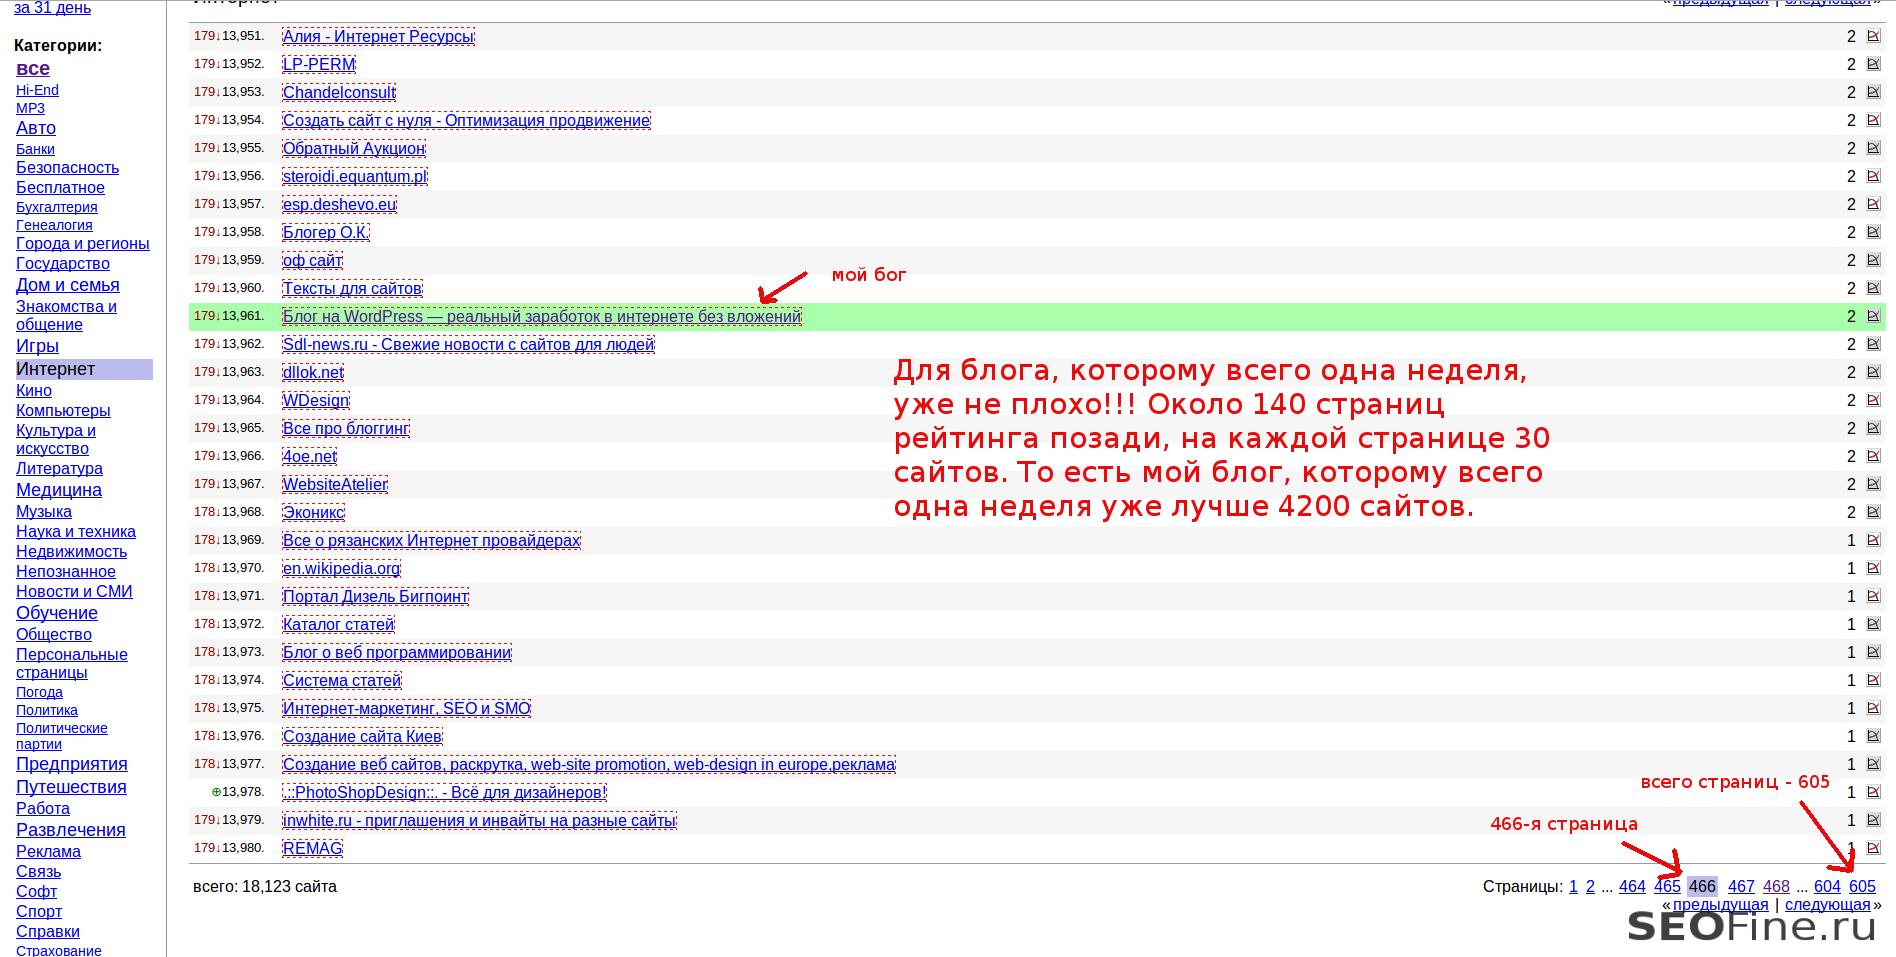 Li-рейтинг блога seofine.ru